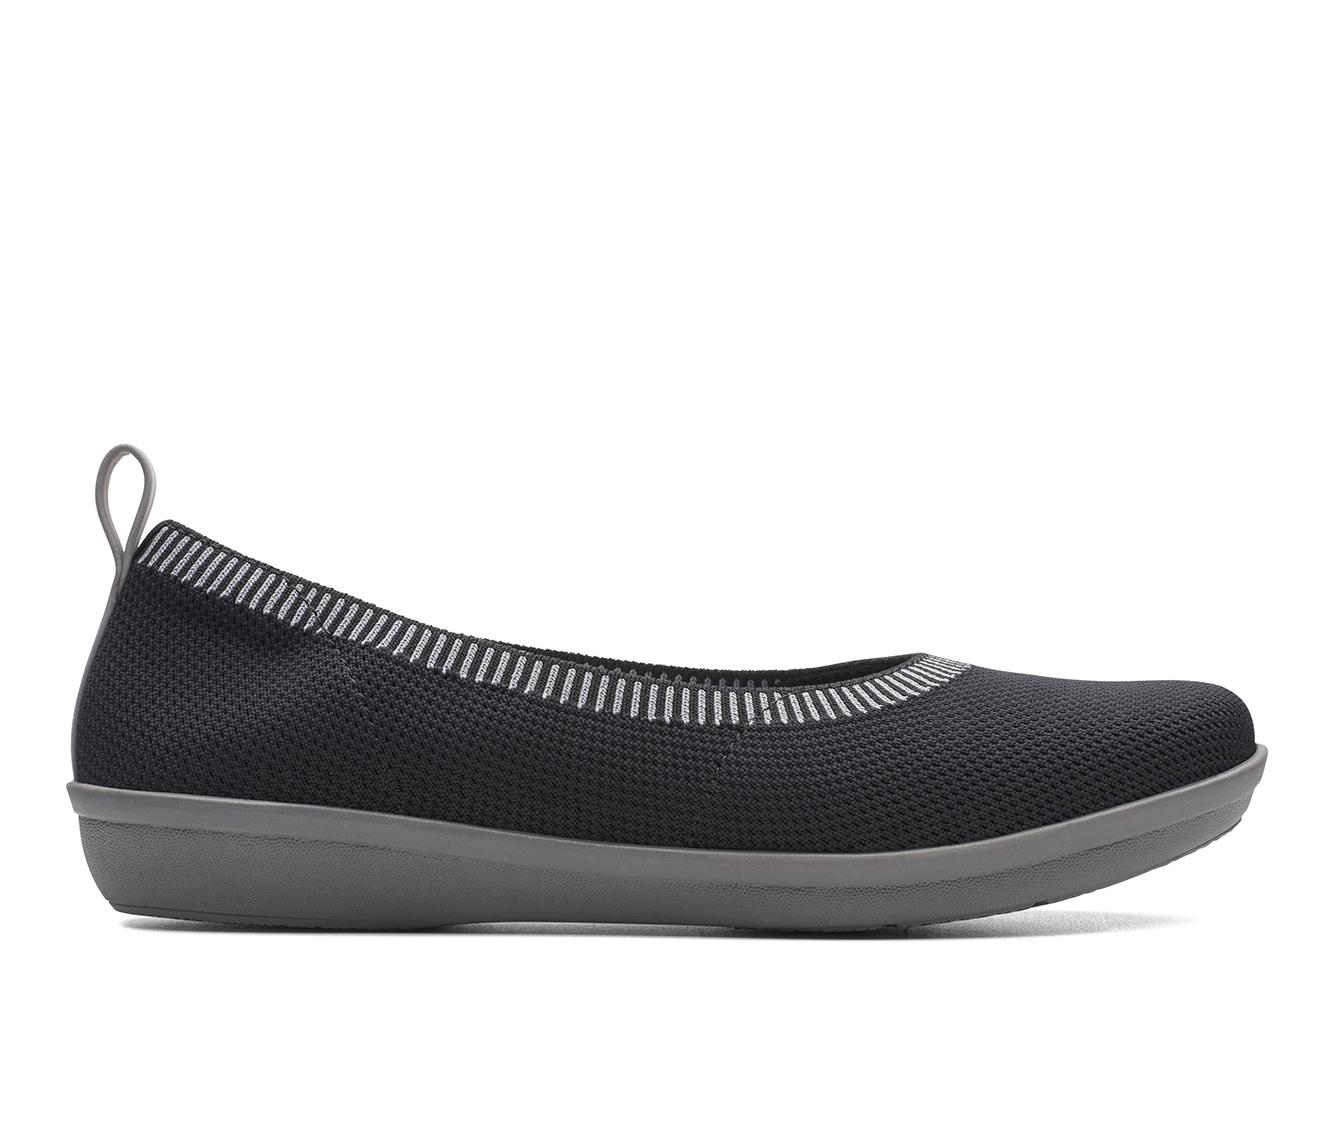 Clarks Ayla Form Women's Shoe (Black Canvas)